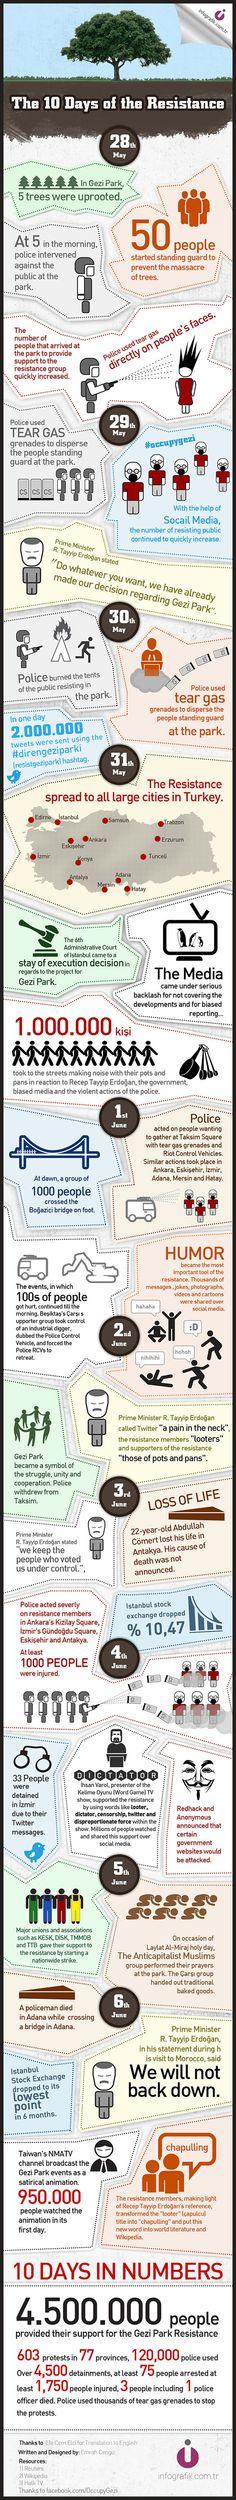 #infographic #occupyturkey #occupygezi